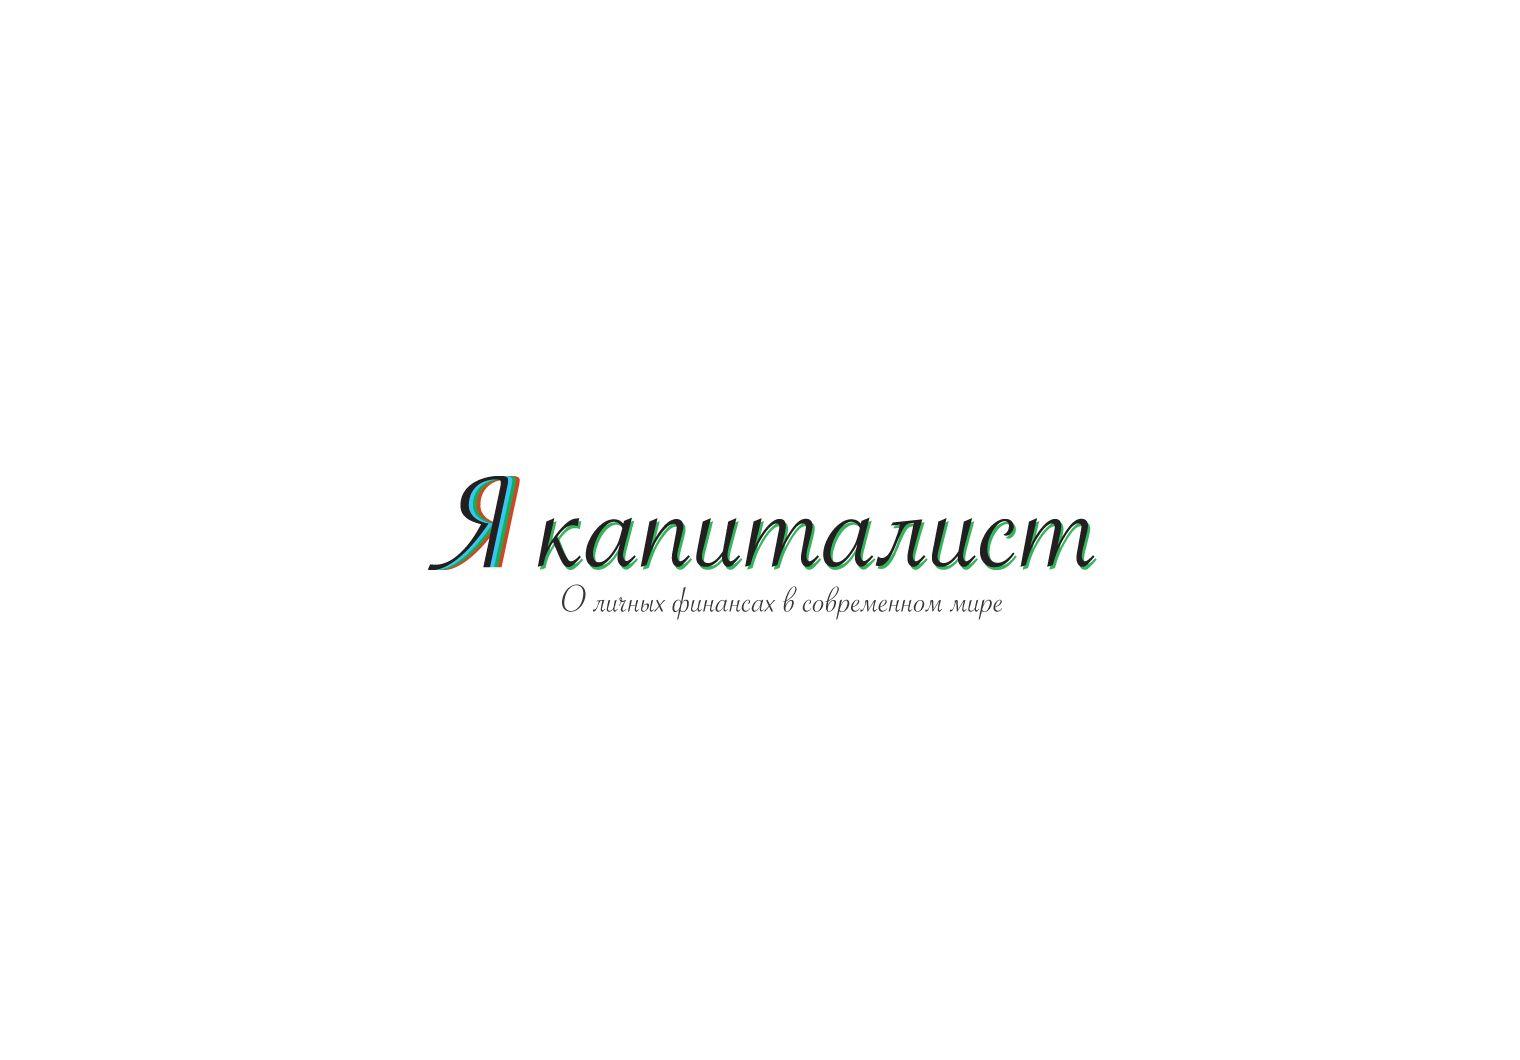 Я капиталист (лого для веб-сайта) - дизайнер paulkreis